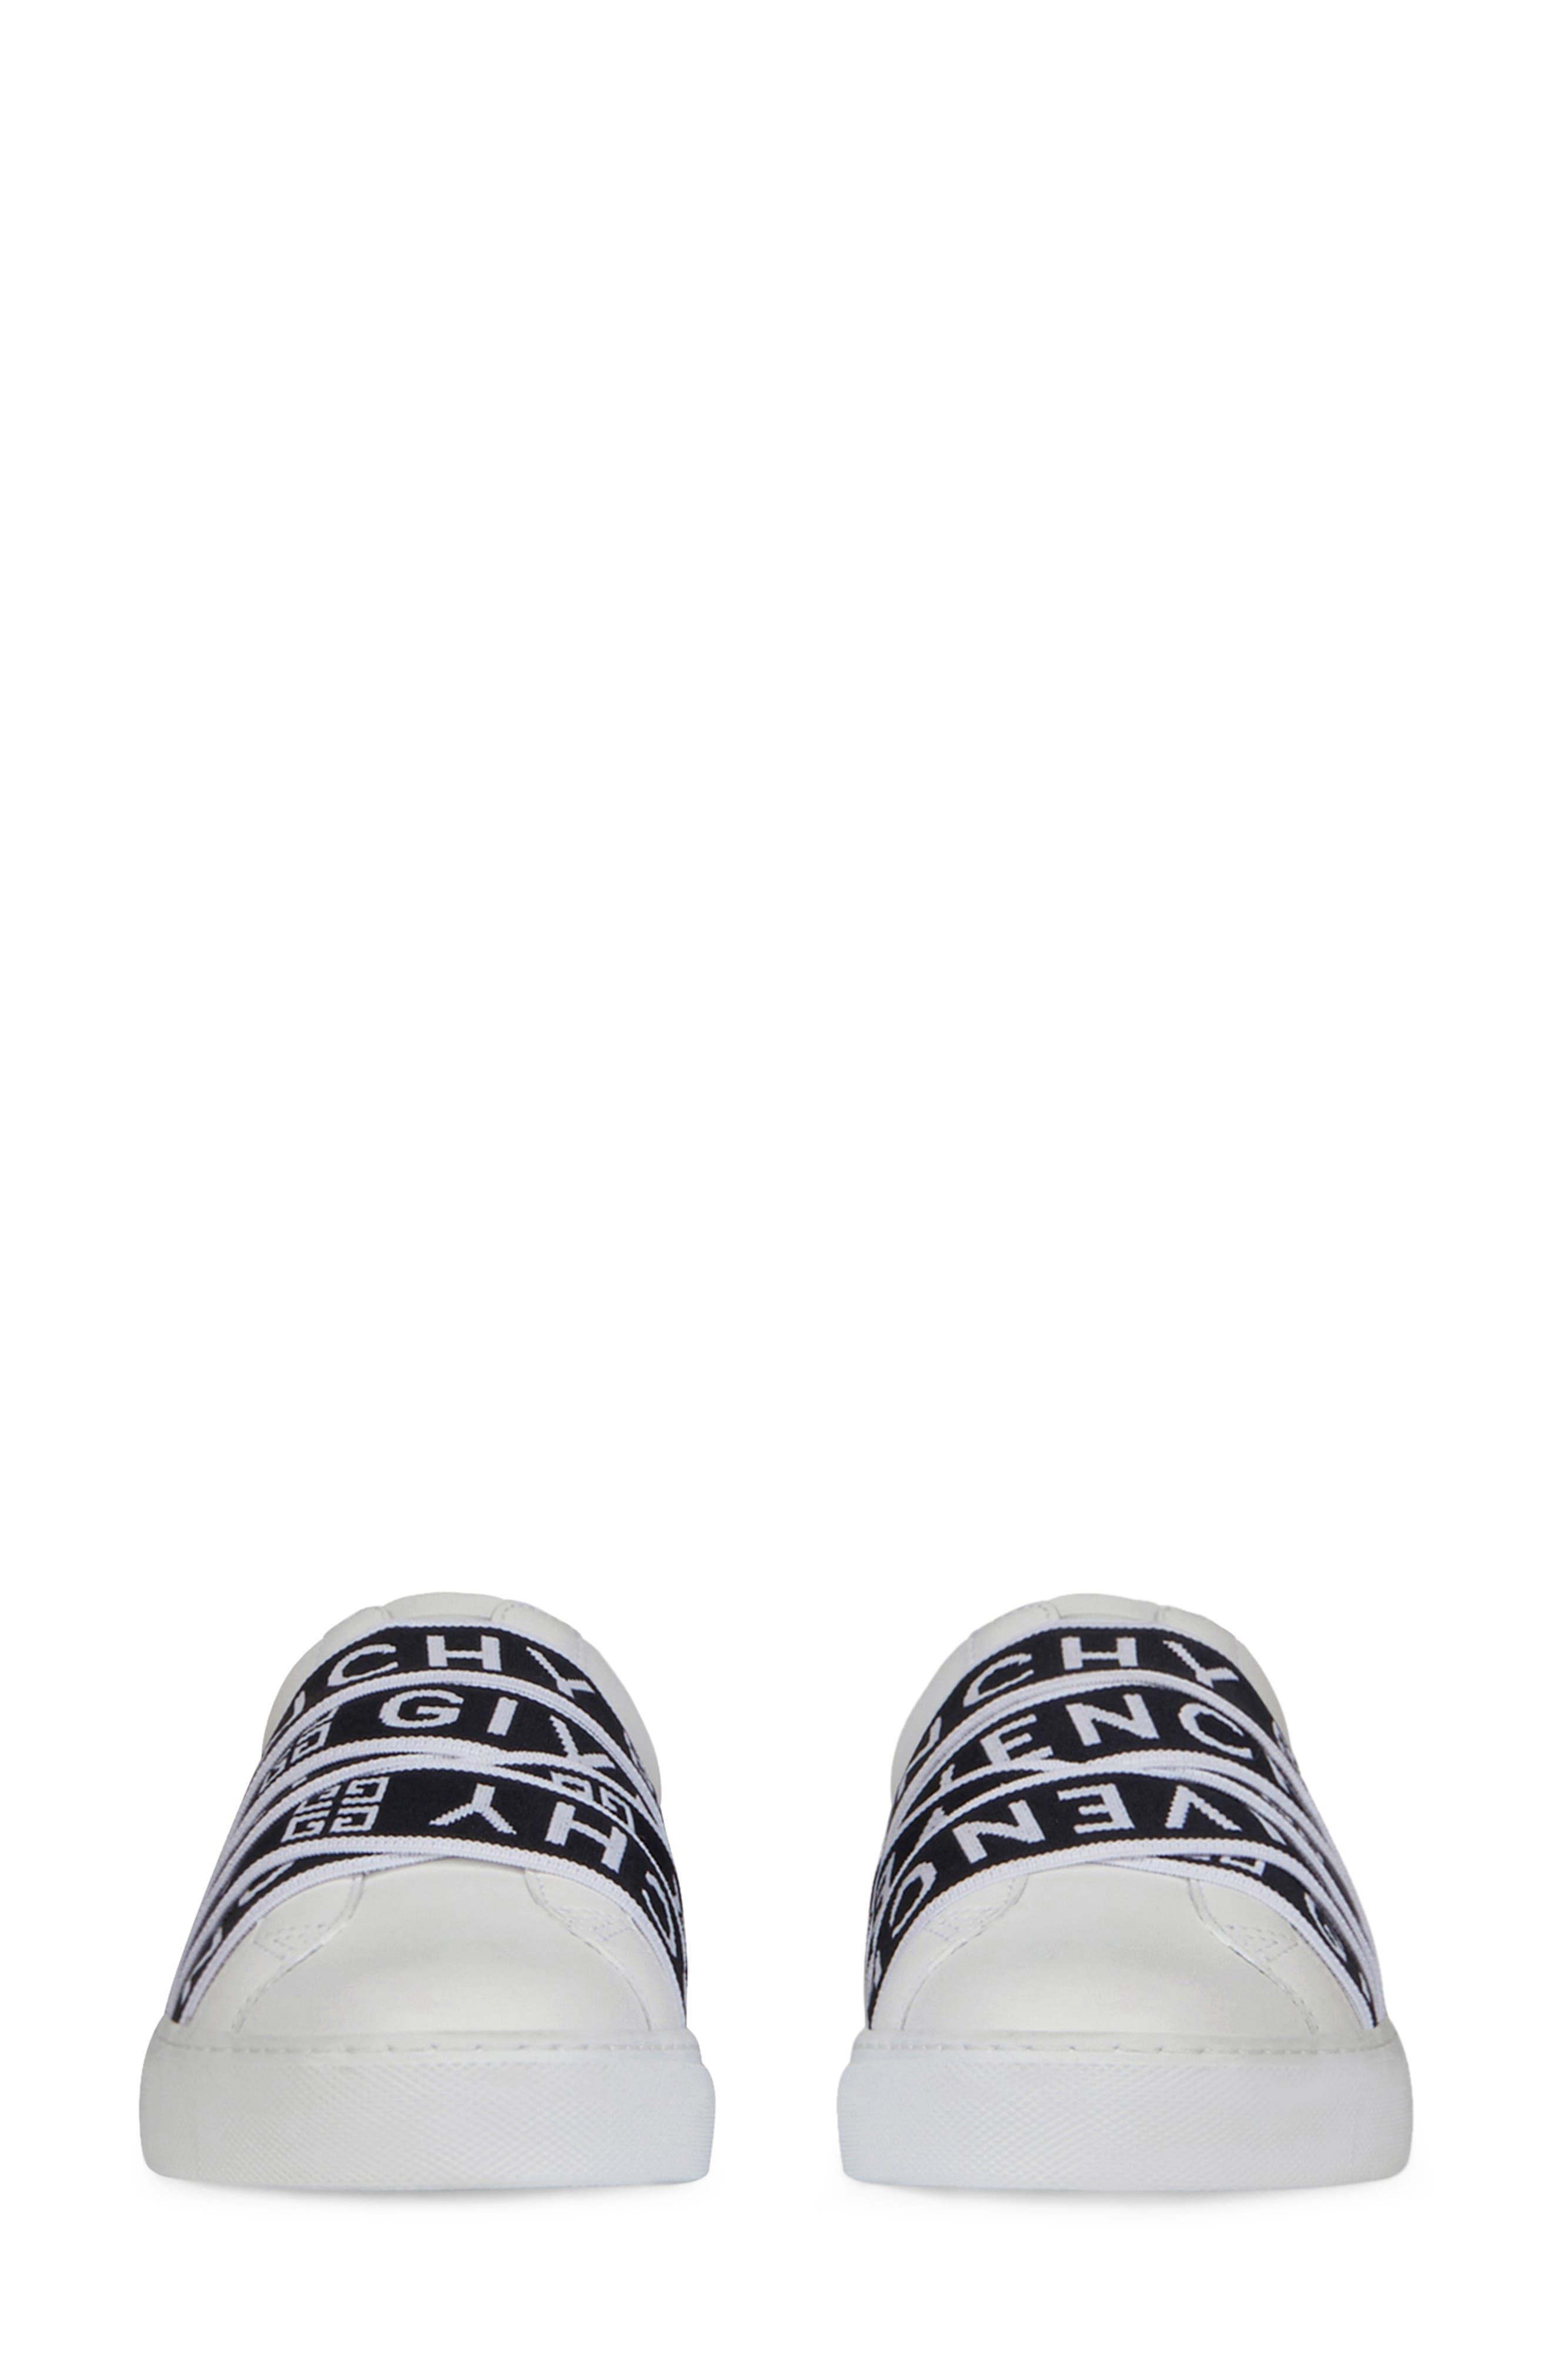 GIVENCHY,                             Urban Street Logo Strap Sneaker,                             Alternate thumbnail 3, color,                             WHITE/ BLACK